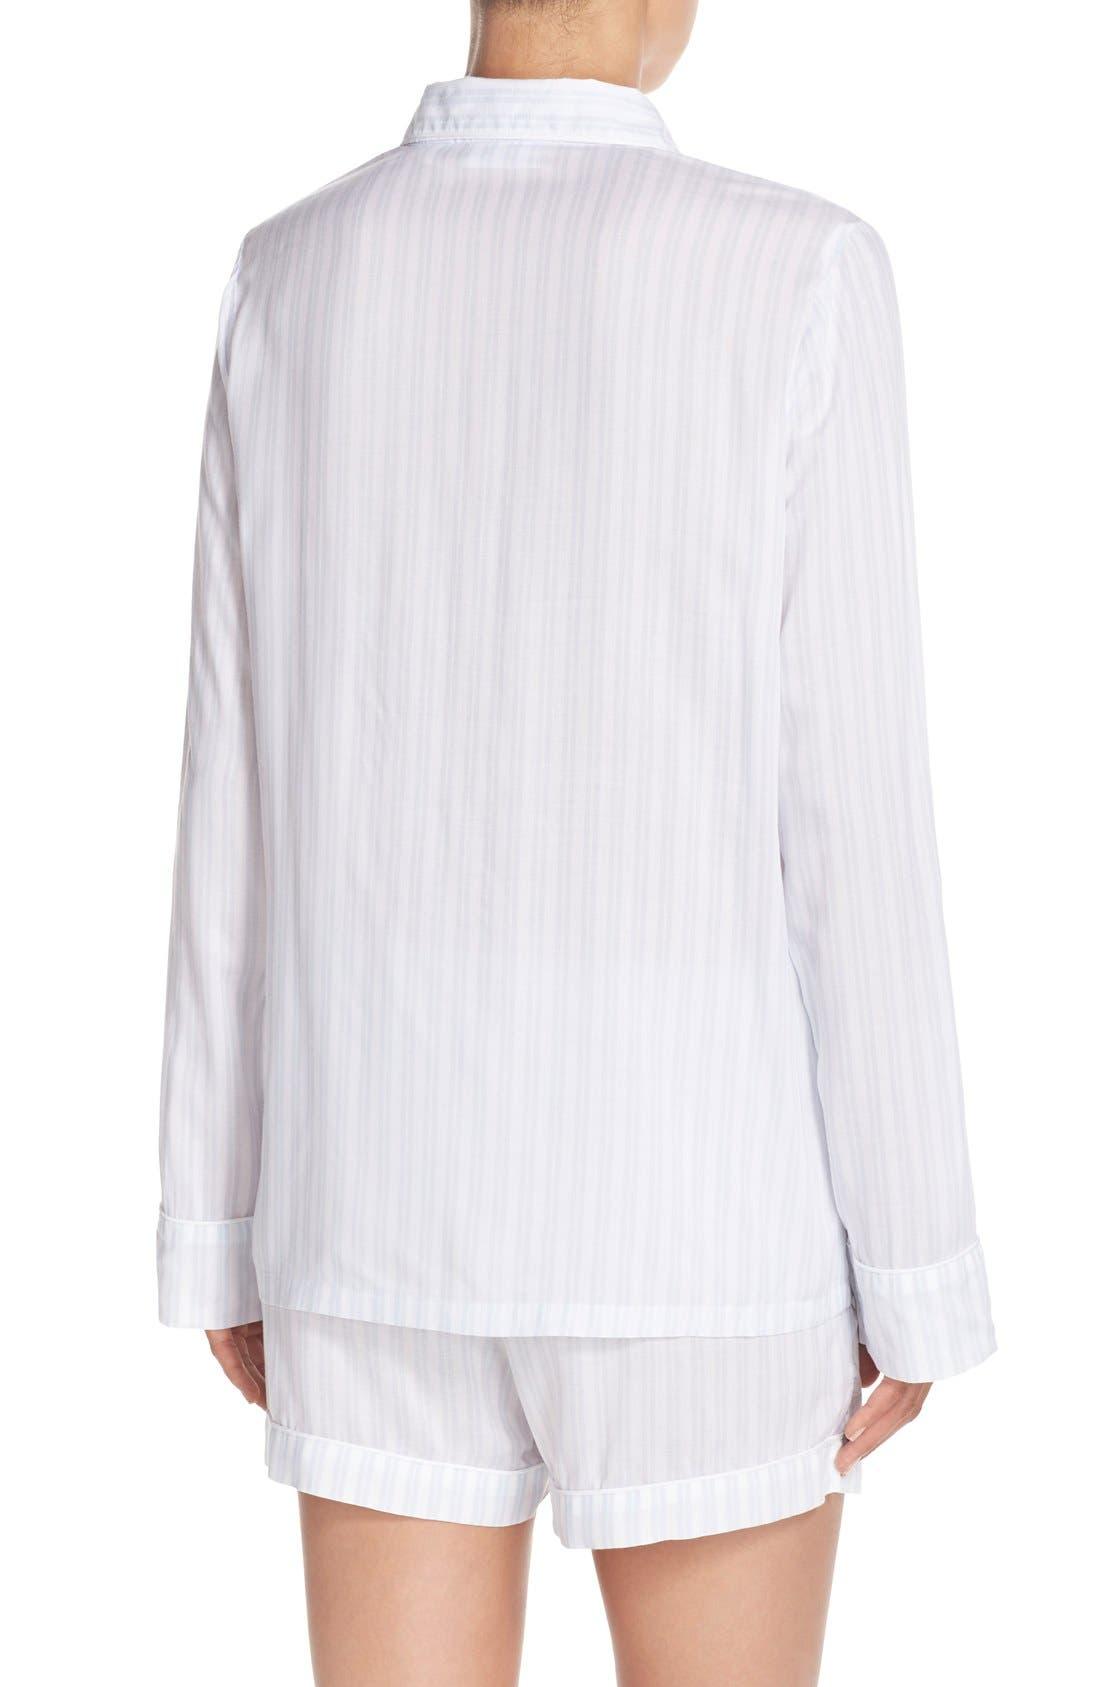 Stripe Short Pajamas,                             Alternate thumbnail 4, color,                             450